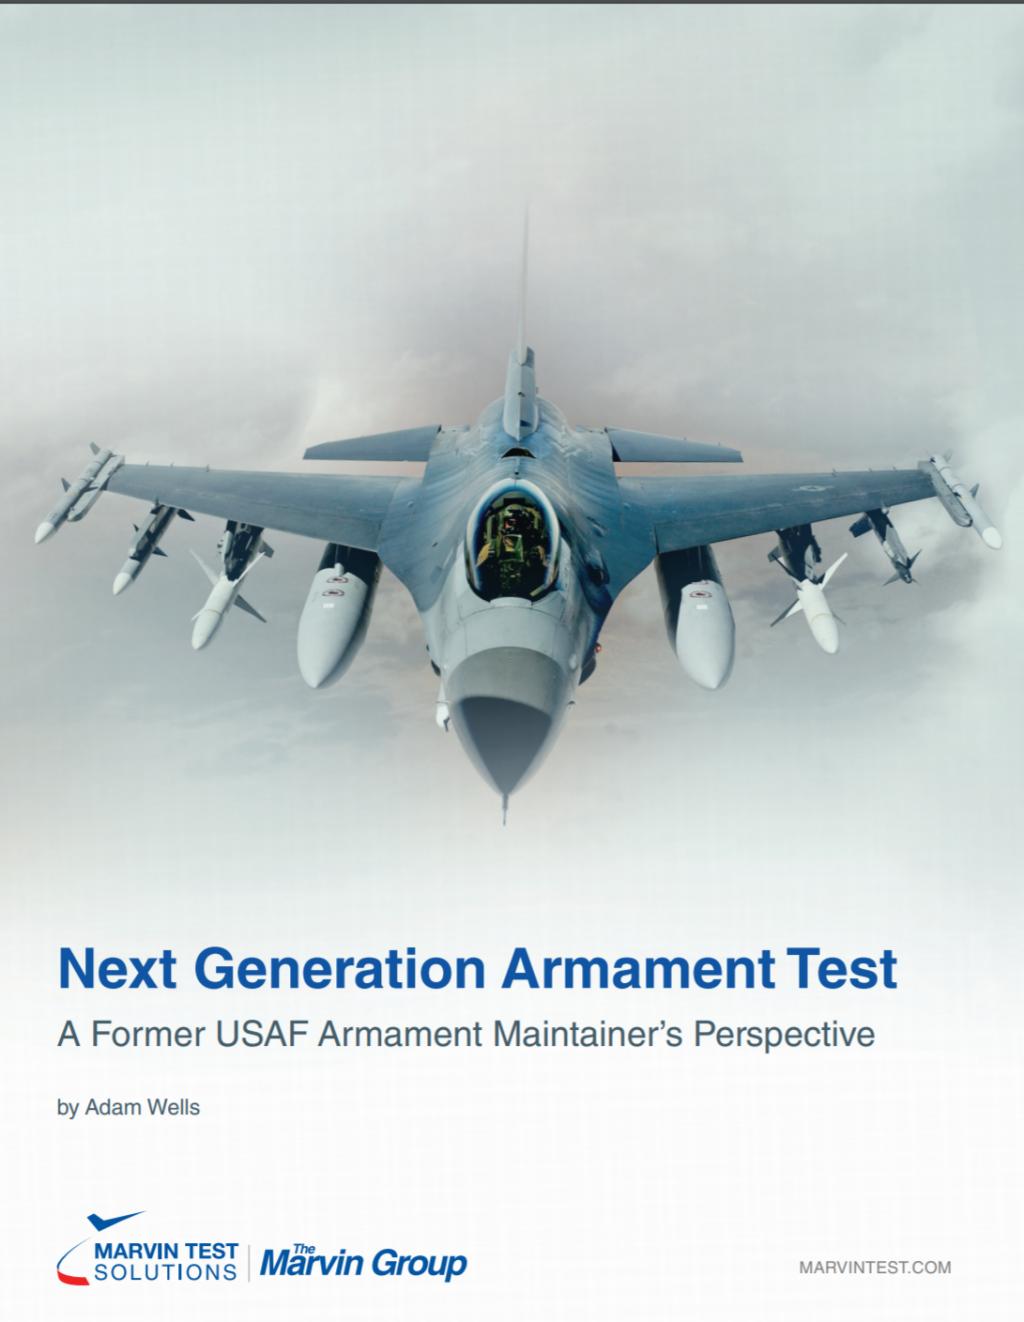 Next Generation Armament Test